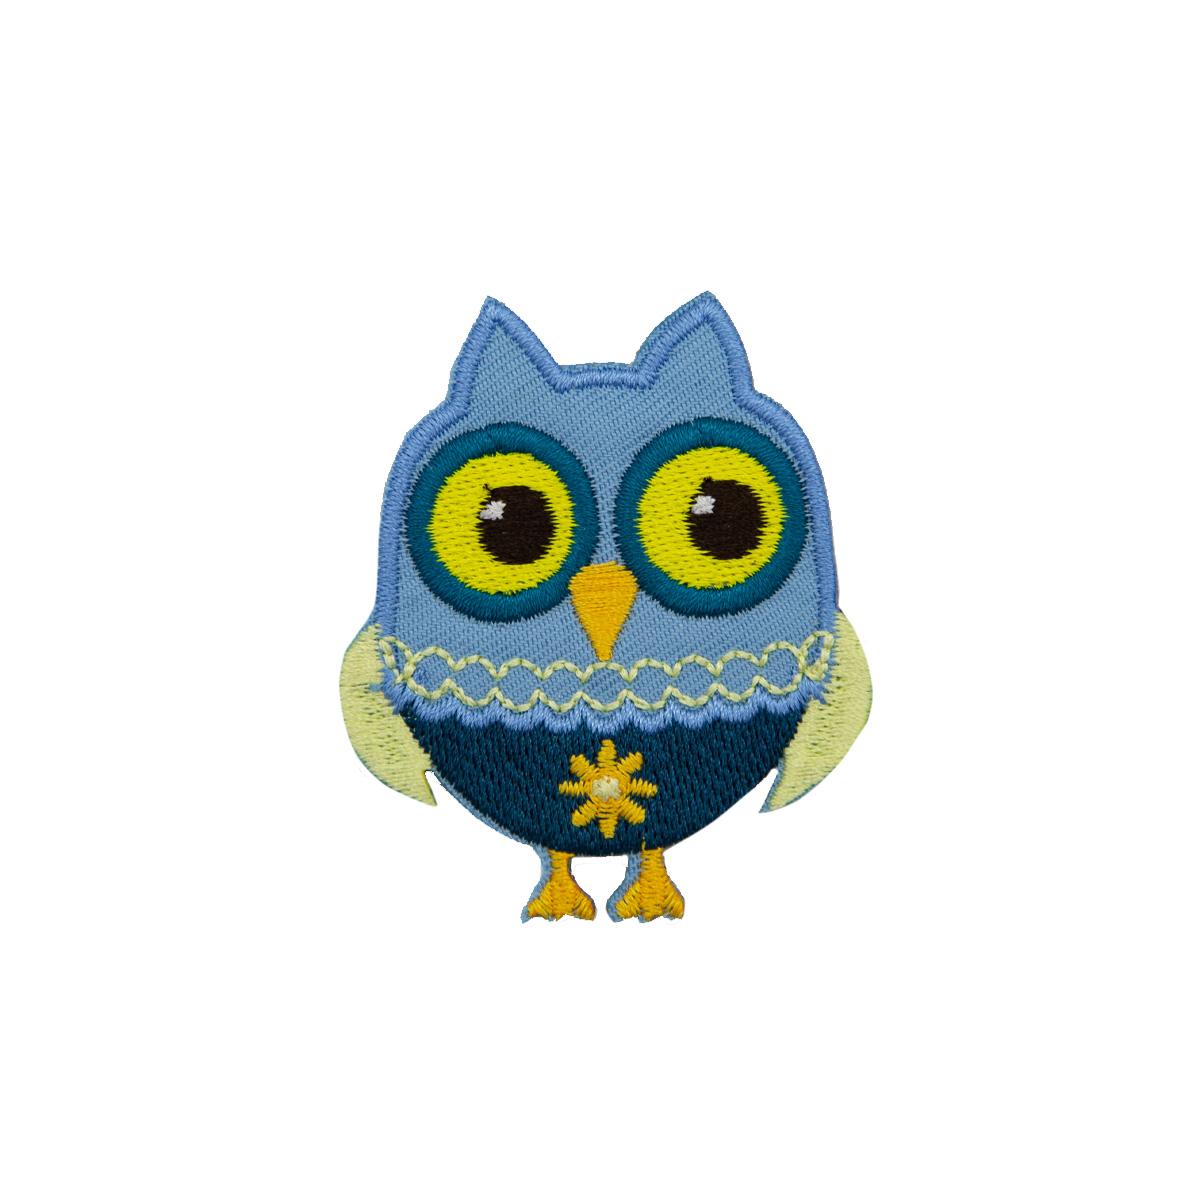 Термоаппликация 'Совенок голубой' Hobby&Pro